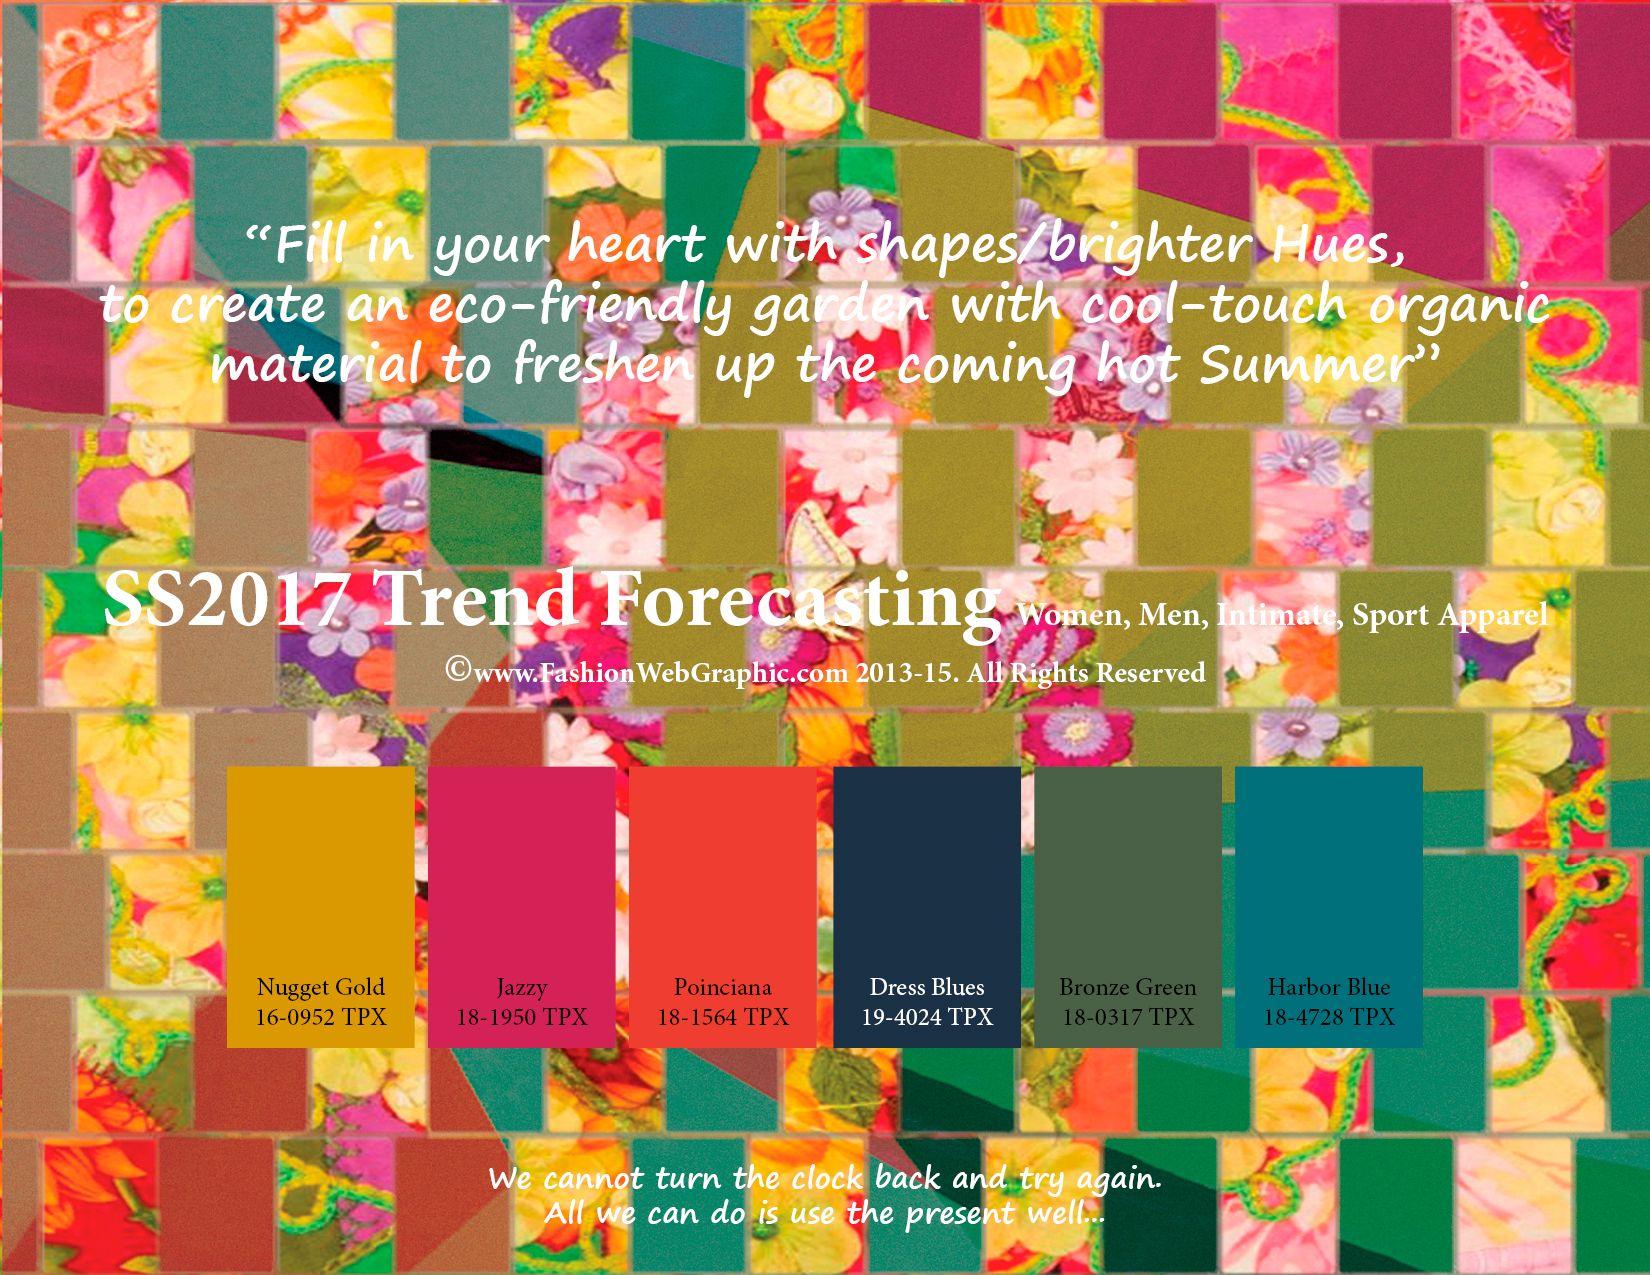 Springsummer 2017 Trend Forecasting Is A Trendcolor Guide That Offer